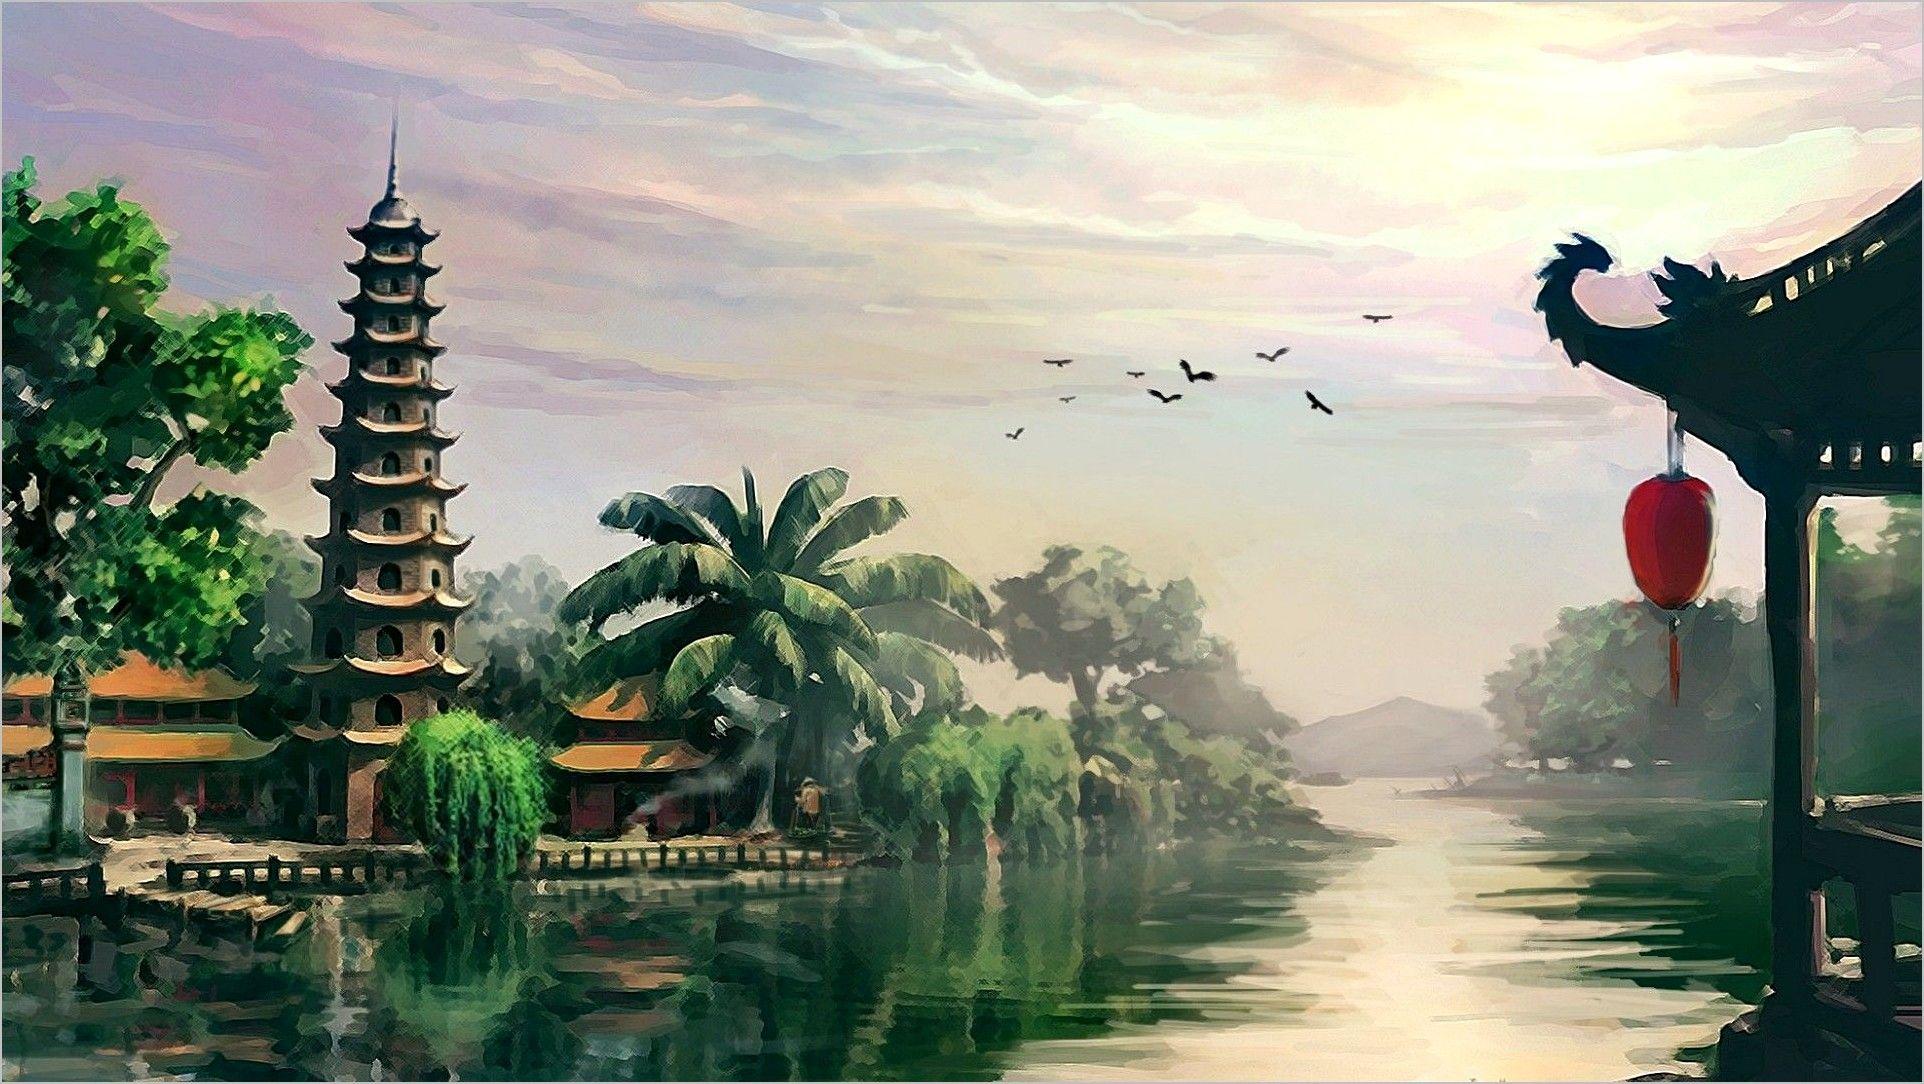 4k Wallpaper Vietnam Oil Panit In 2020 Painting Wallpaper Landscape Paintings Nature Wallpaper